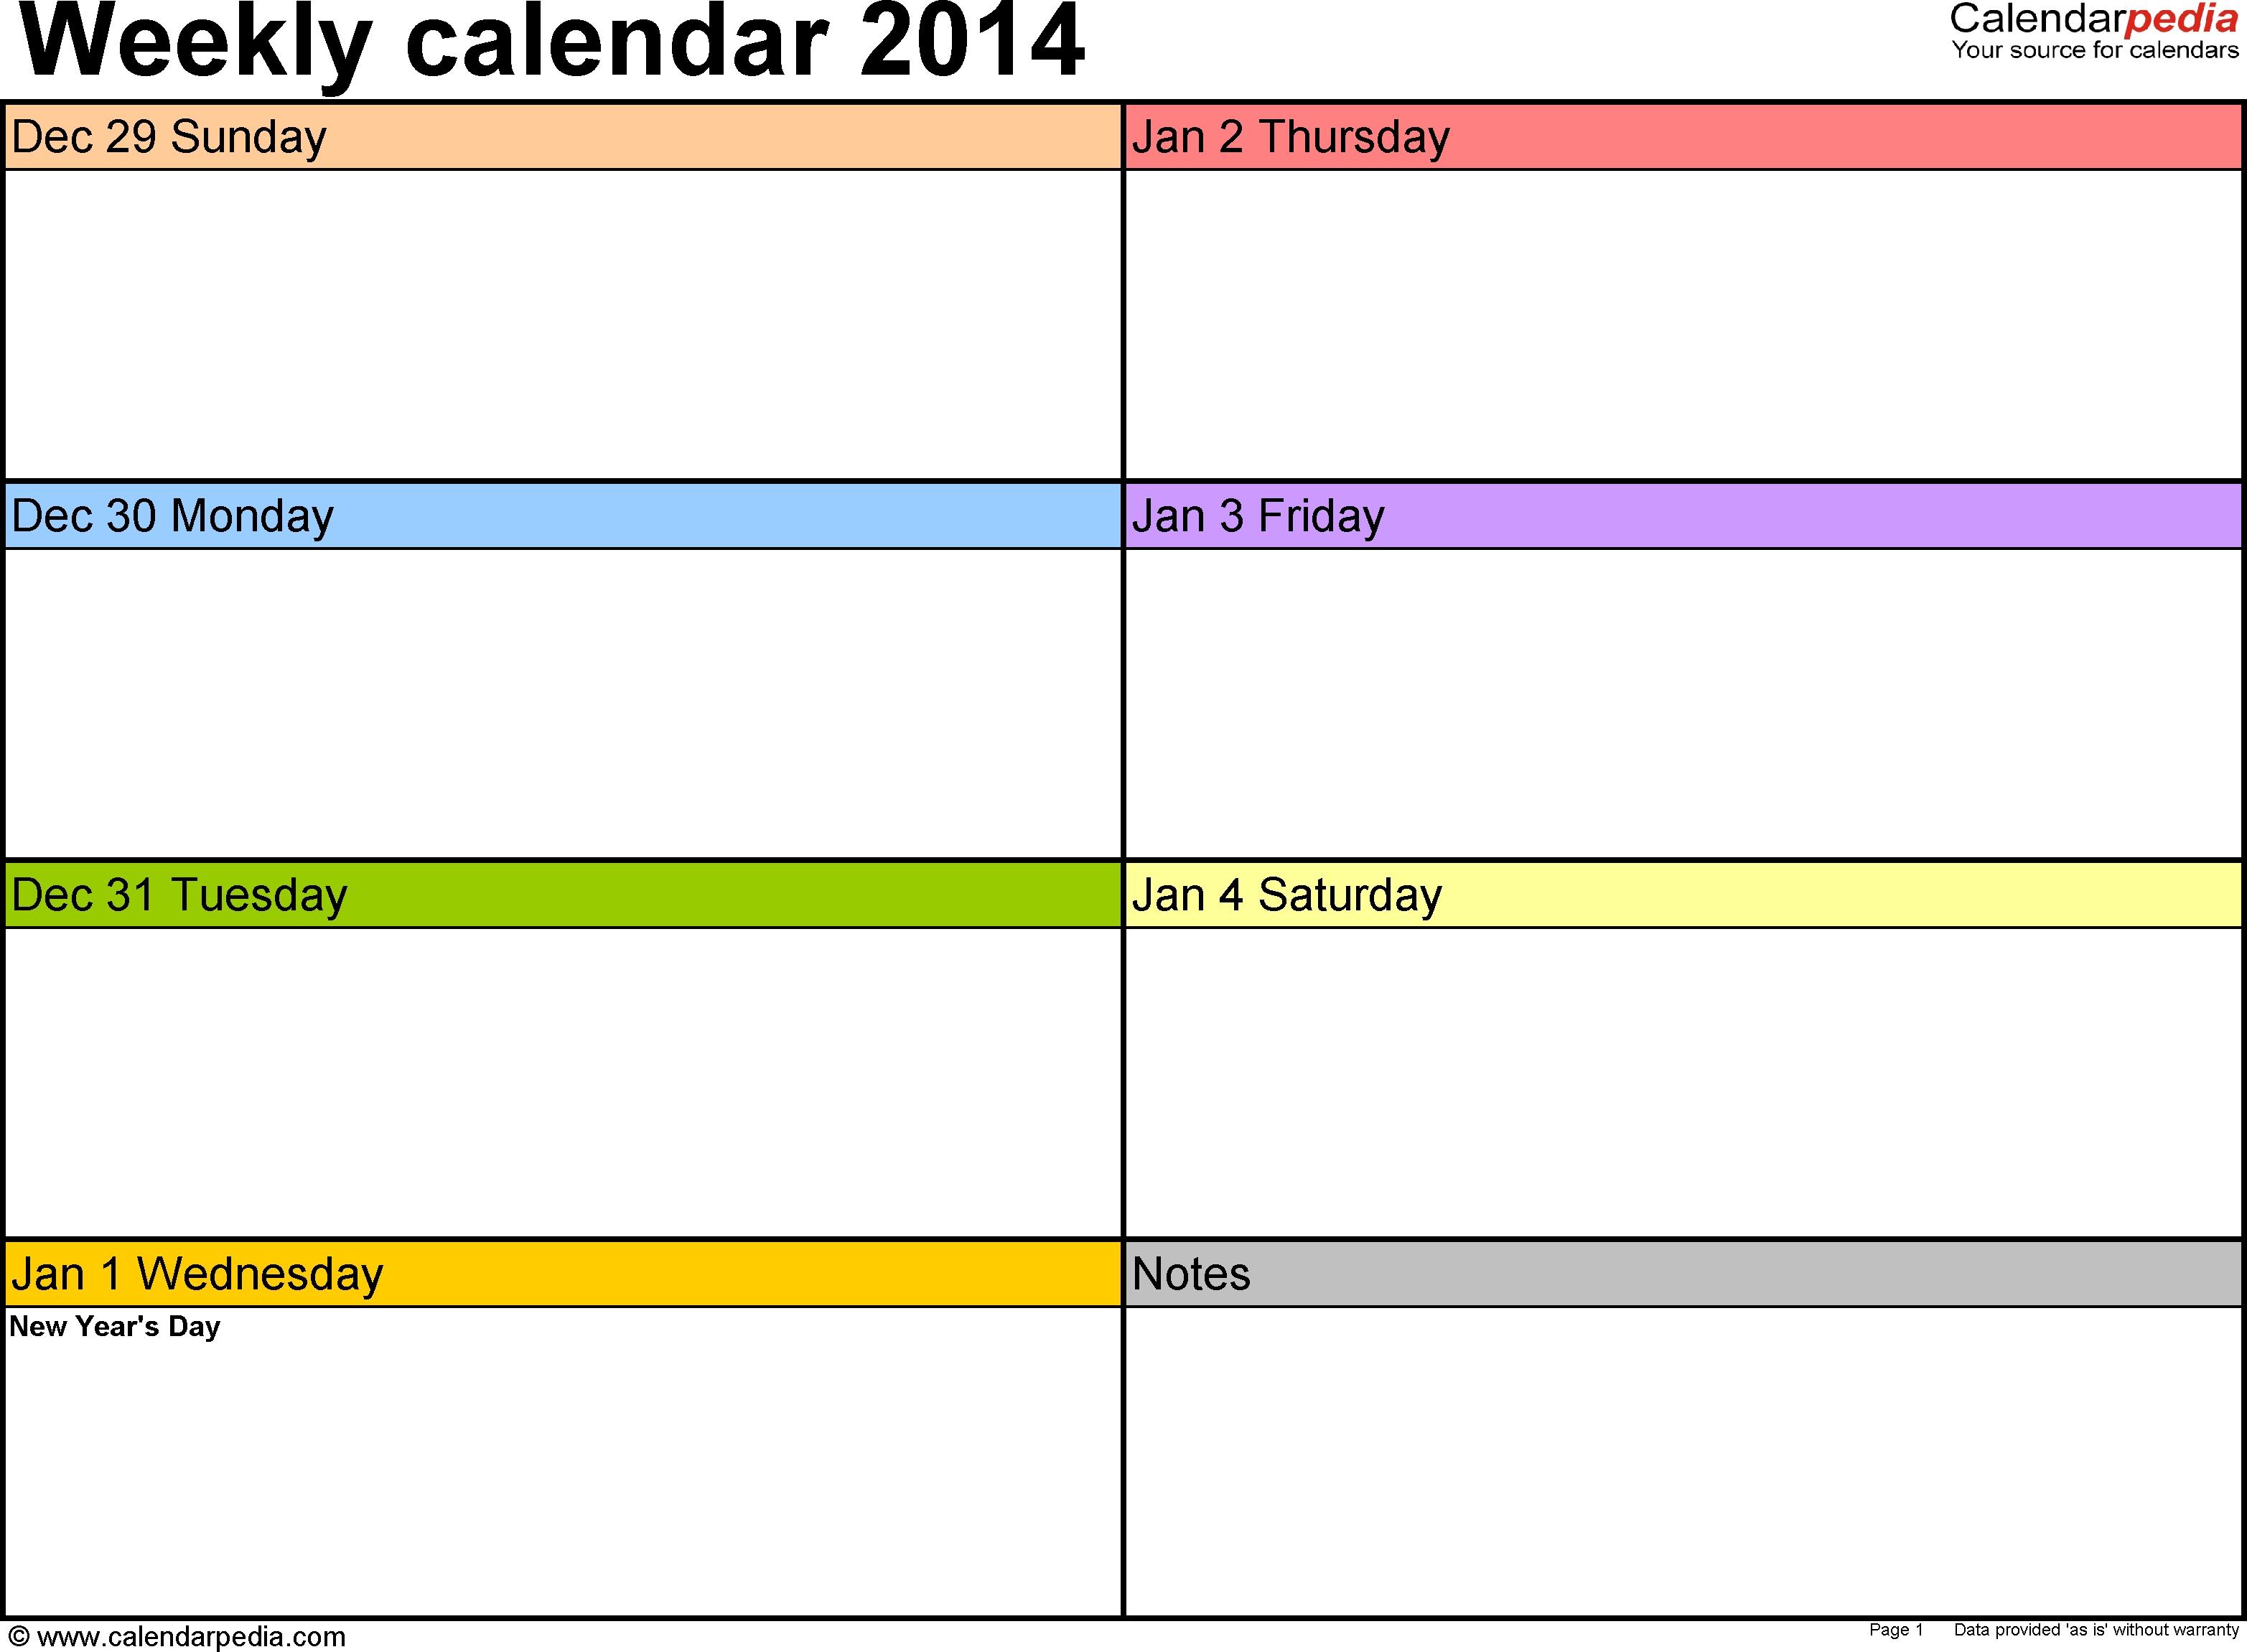 Weekly Calendar 2014 For Word - 4 Free Printable Templates pertaining to Week By Week Calendar Printable